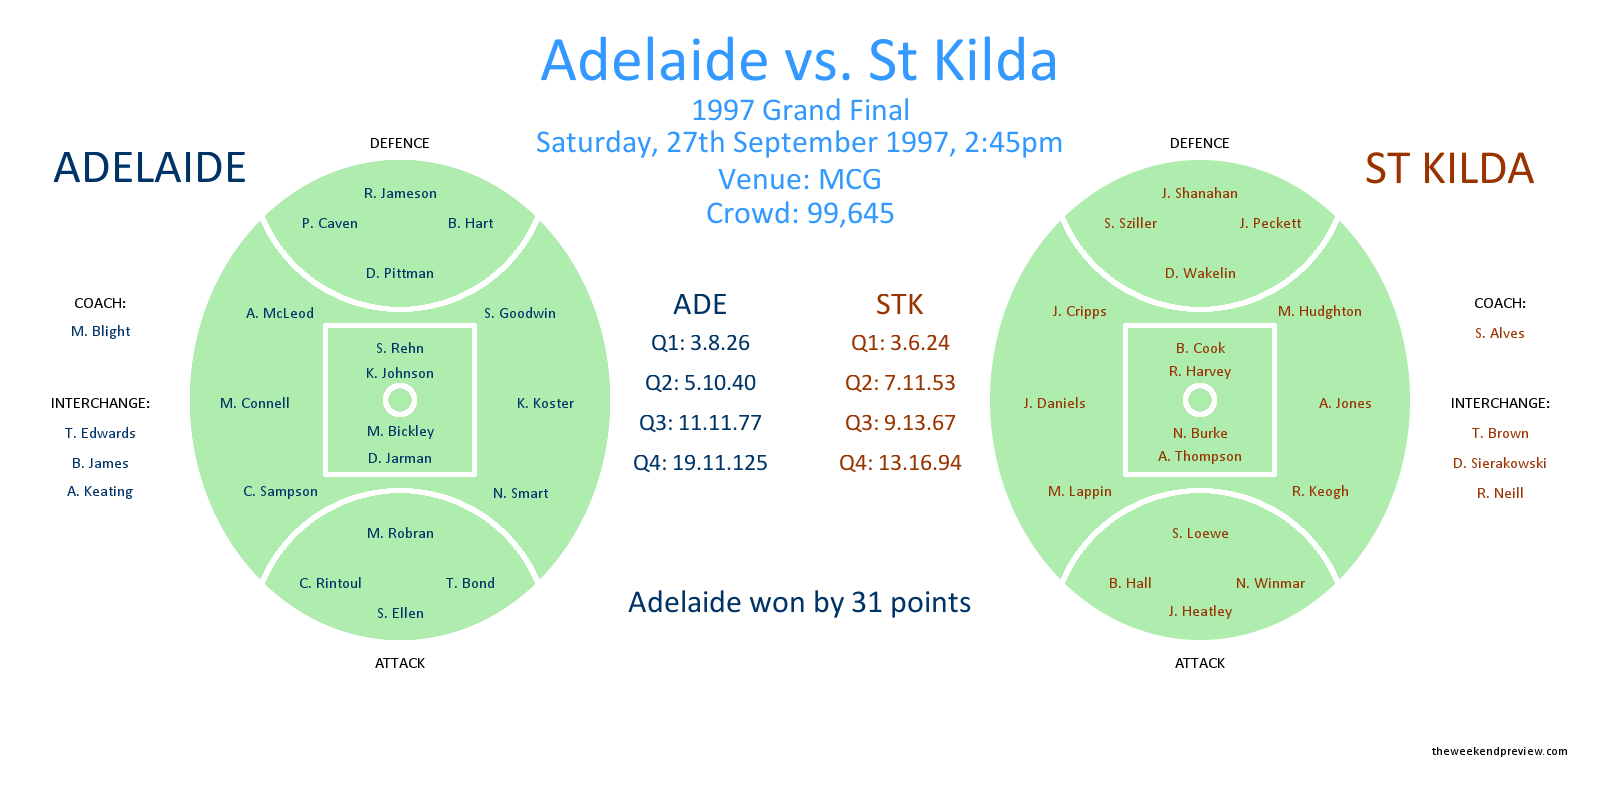 Figure-2: Adelaide vs. St Kilda, 1997 Grand Final